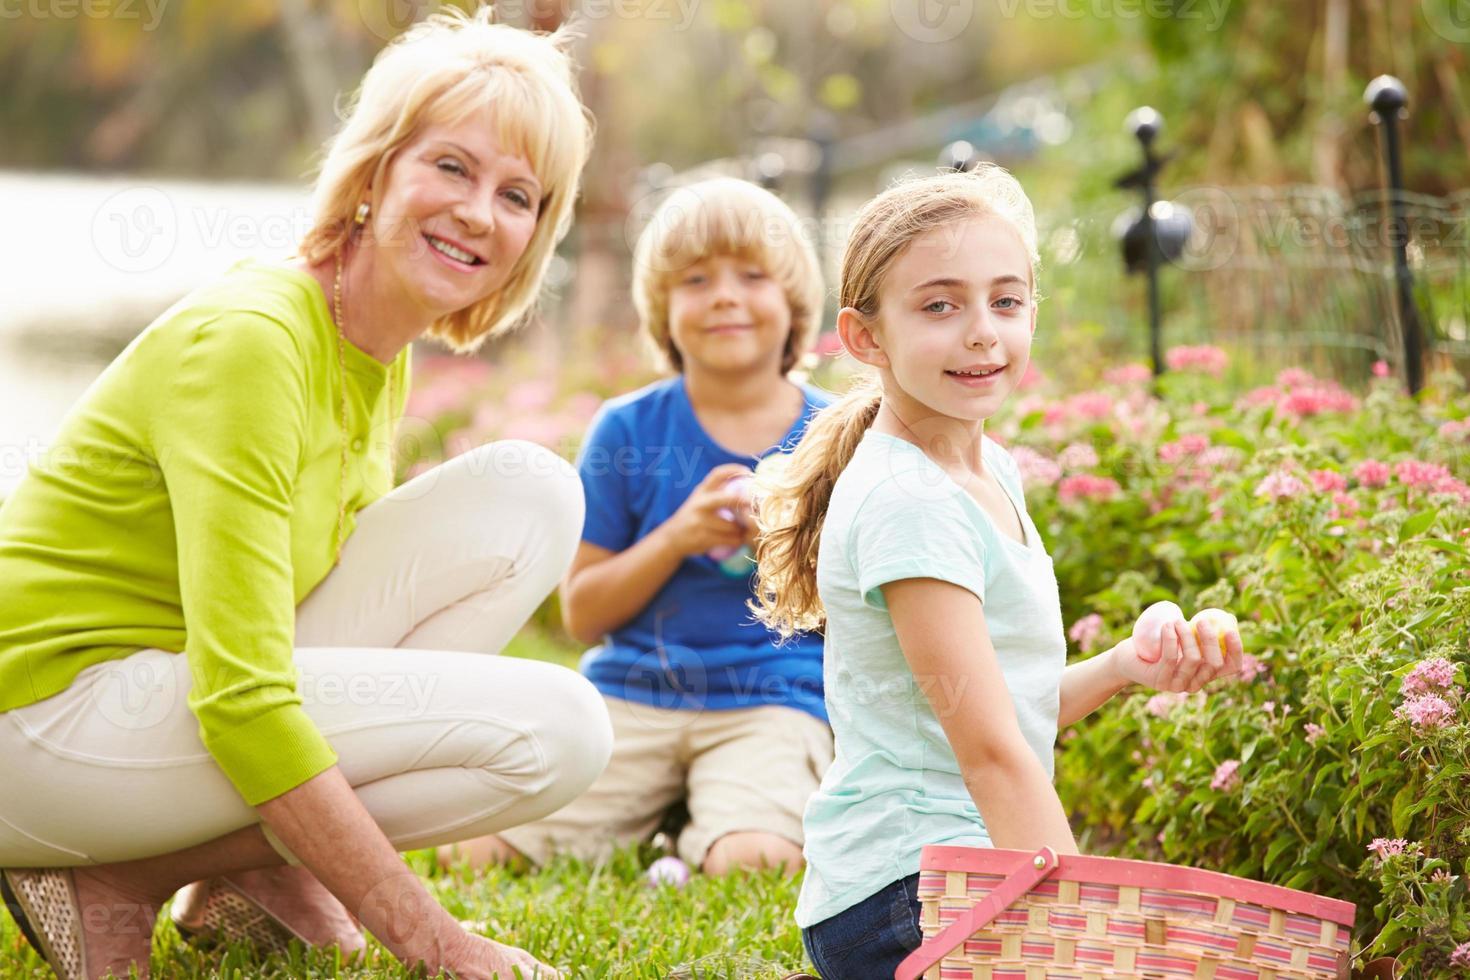 Grandmother With Grandchildren On Easter Egg Hunt In Garden photo